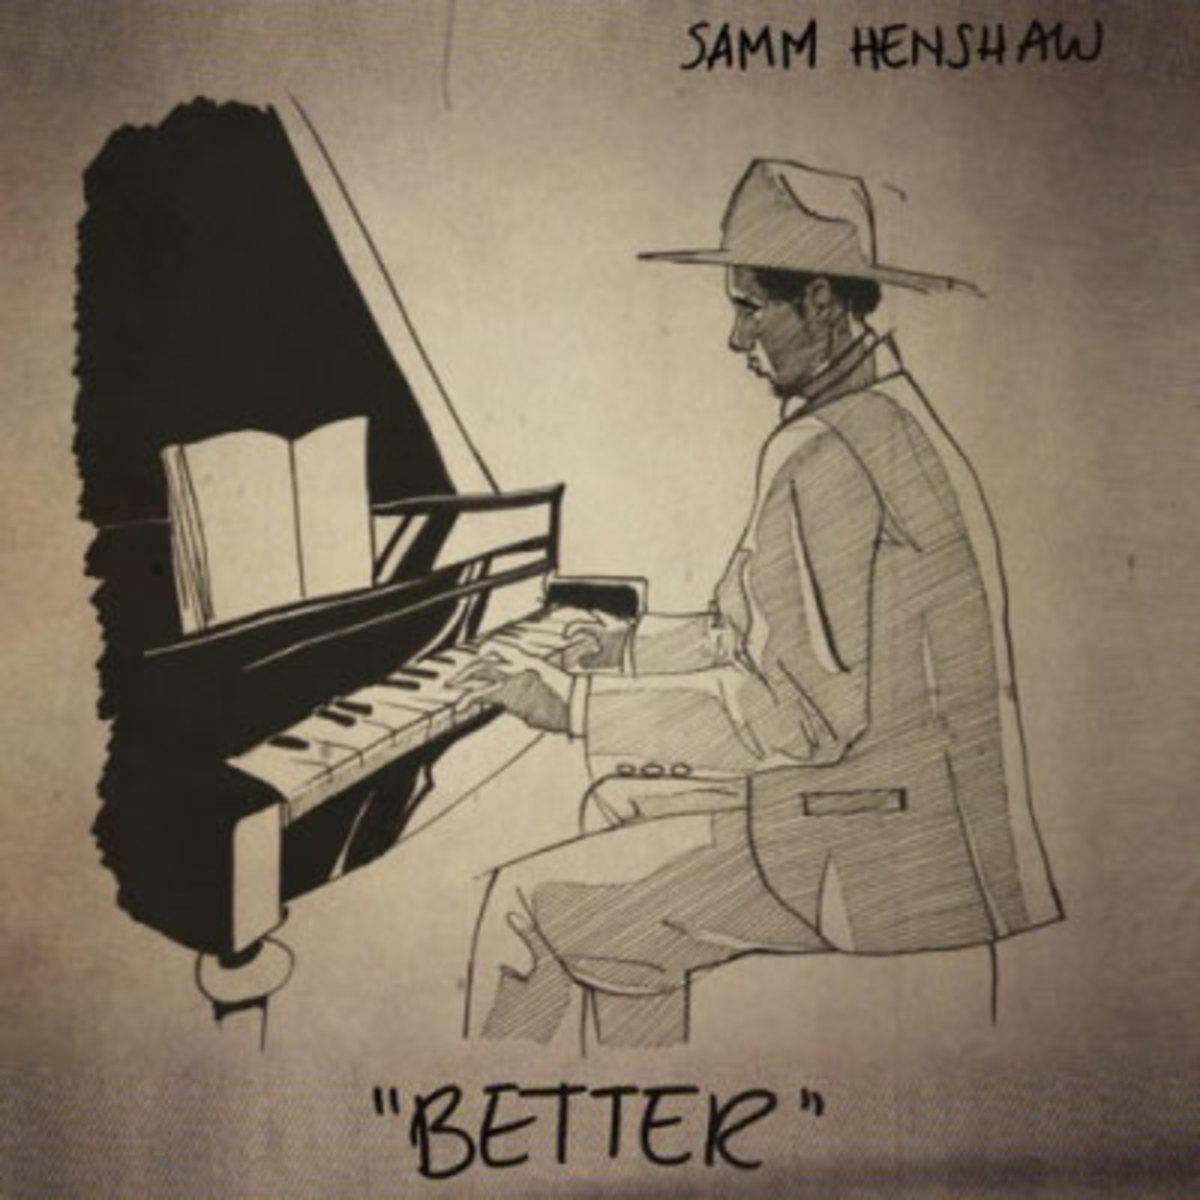 samm-henshaw-better.jpg